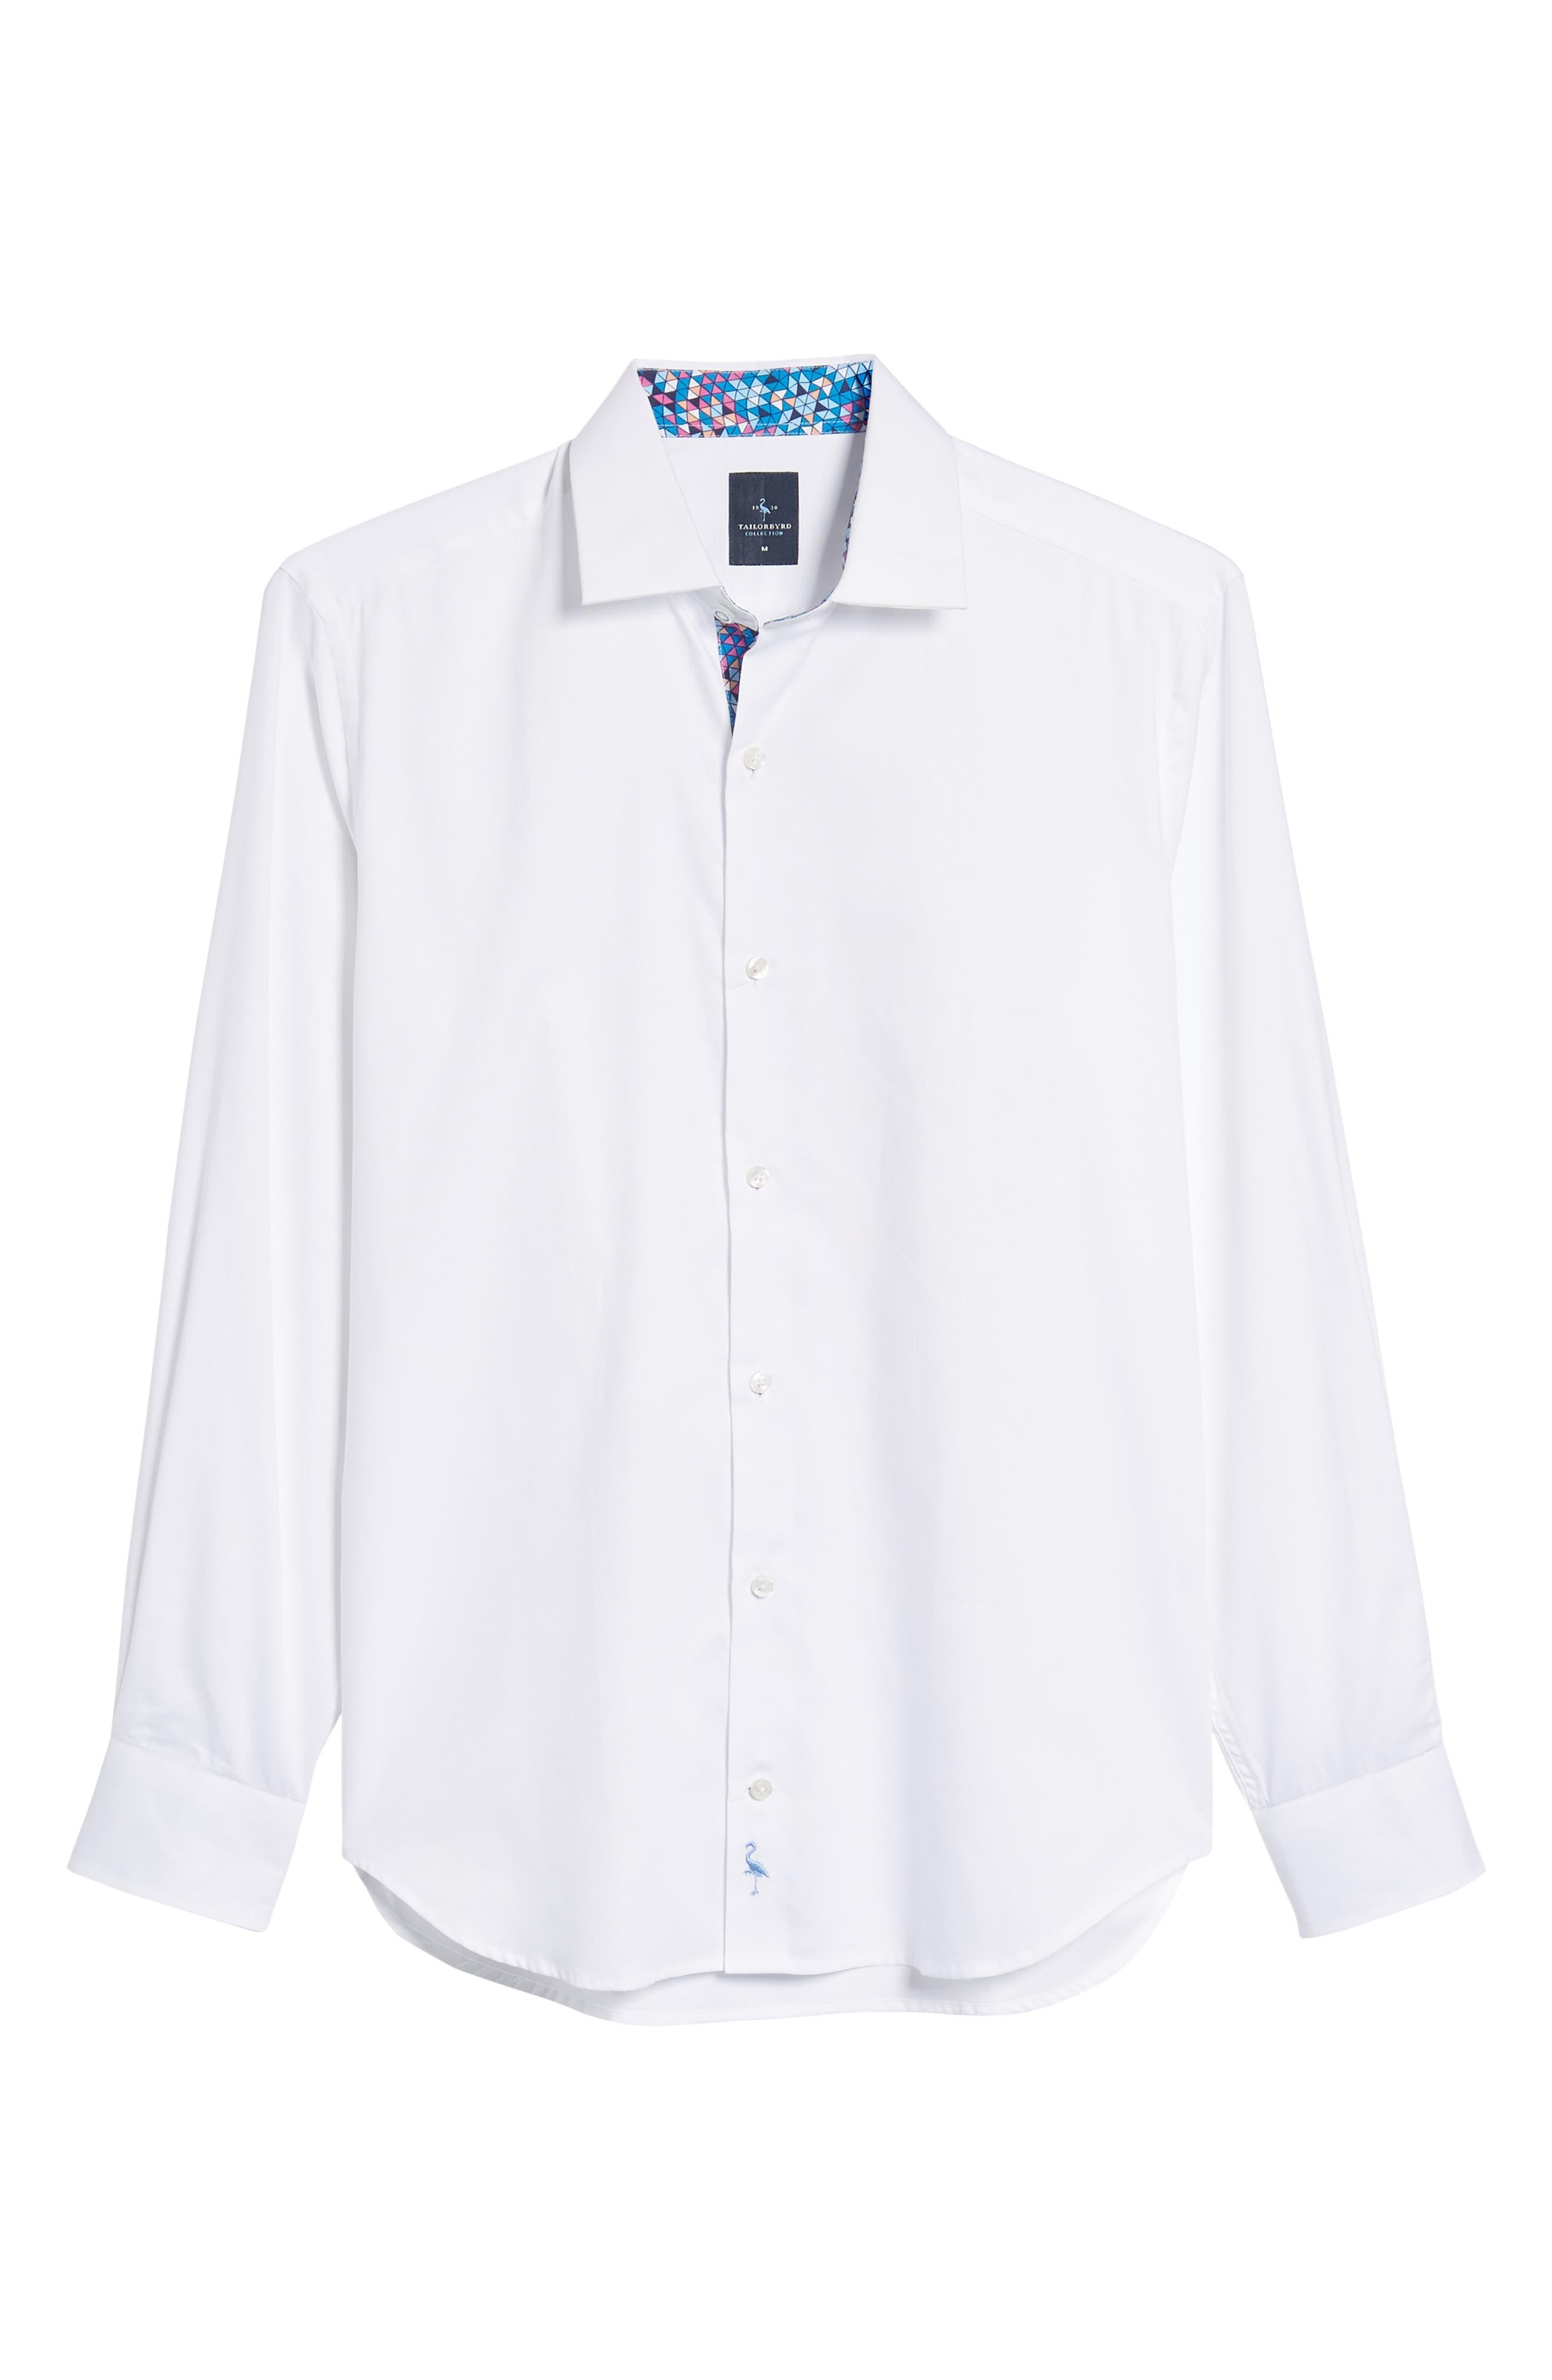 Baxley Regular Fit Sport Shirt,                             Alternate thumbnail 6, color,                             White